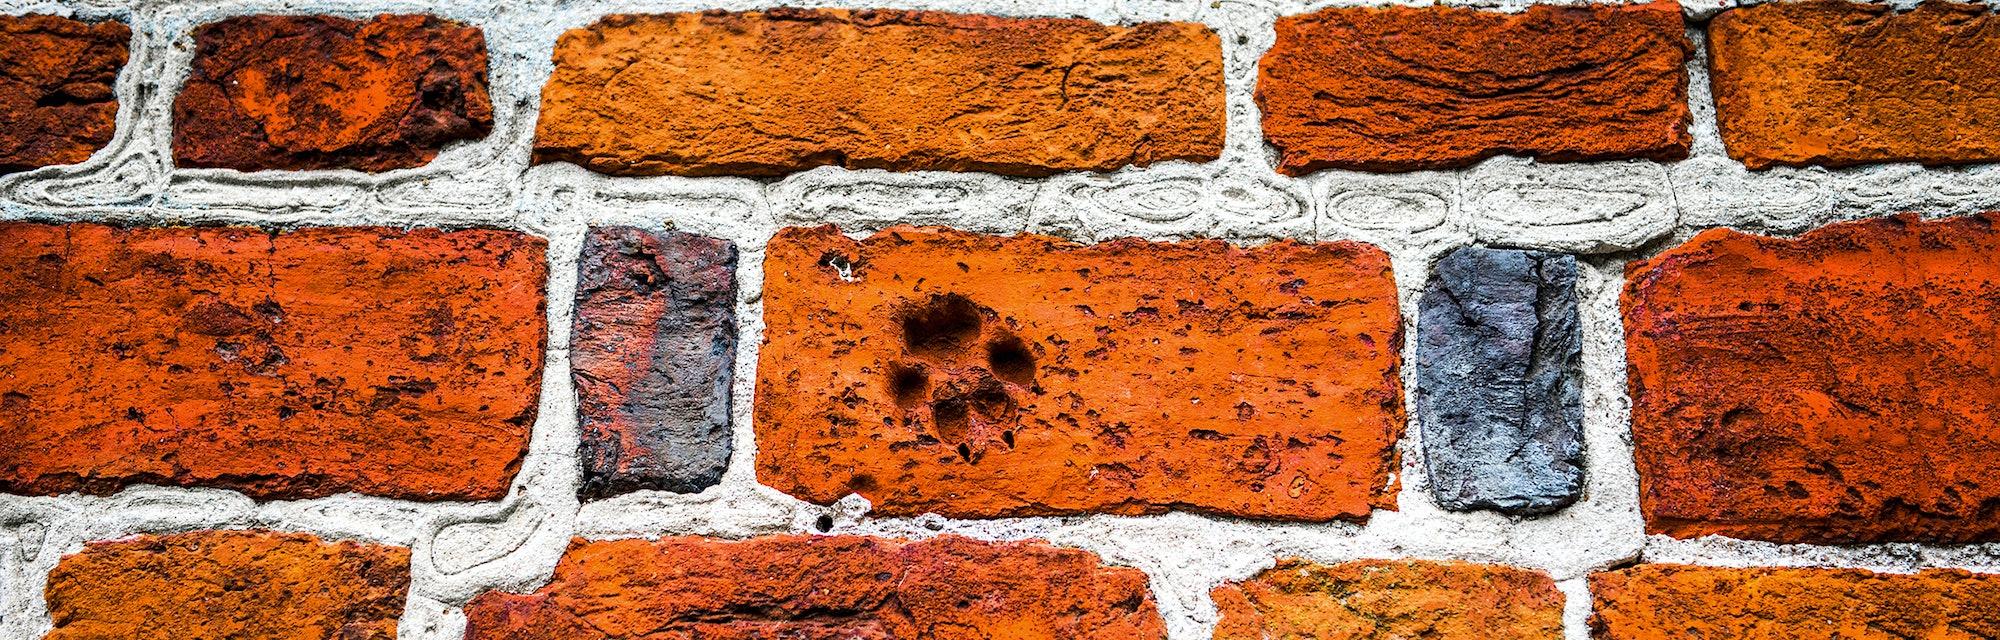 Footprint on red brick wall. Red brick wall footprint. Red brick wall texture. Brick wall footprint